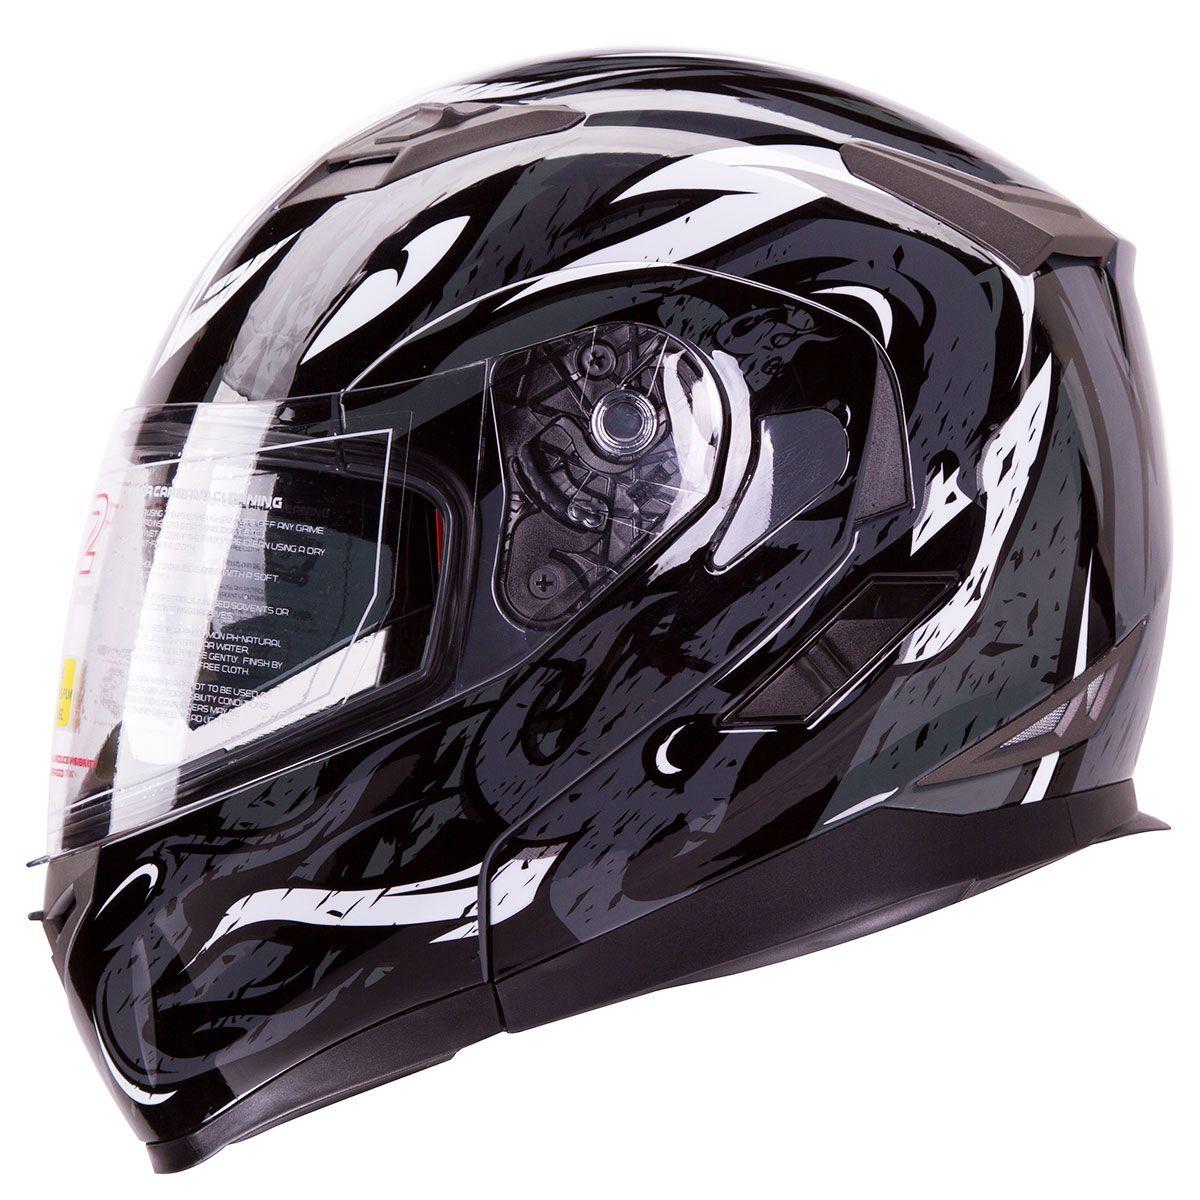 Pin on Motorcycle, motor sports, helmets